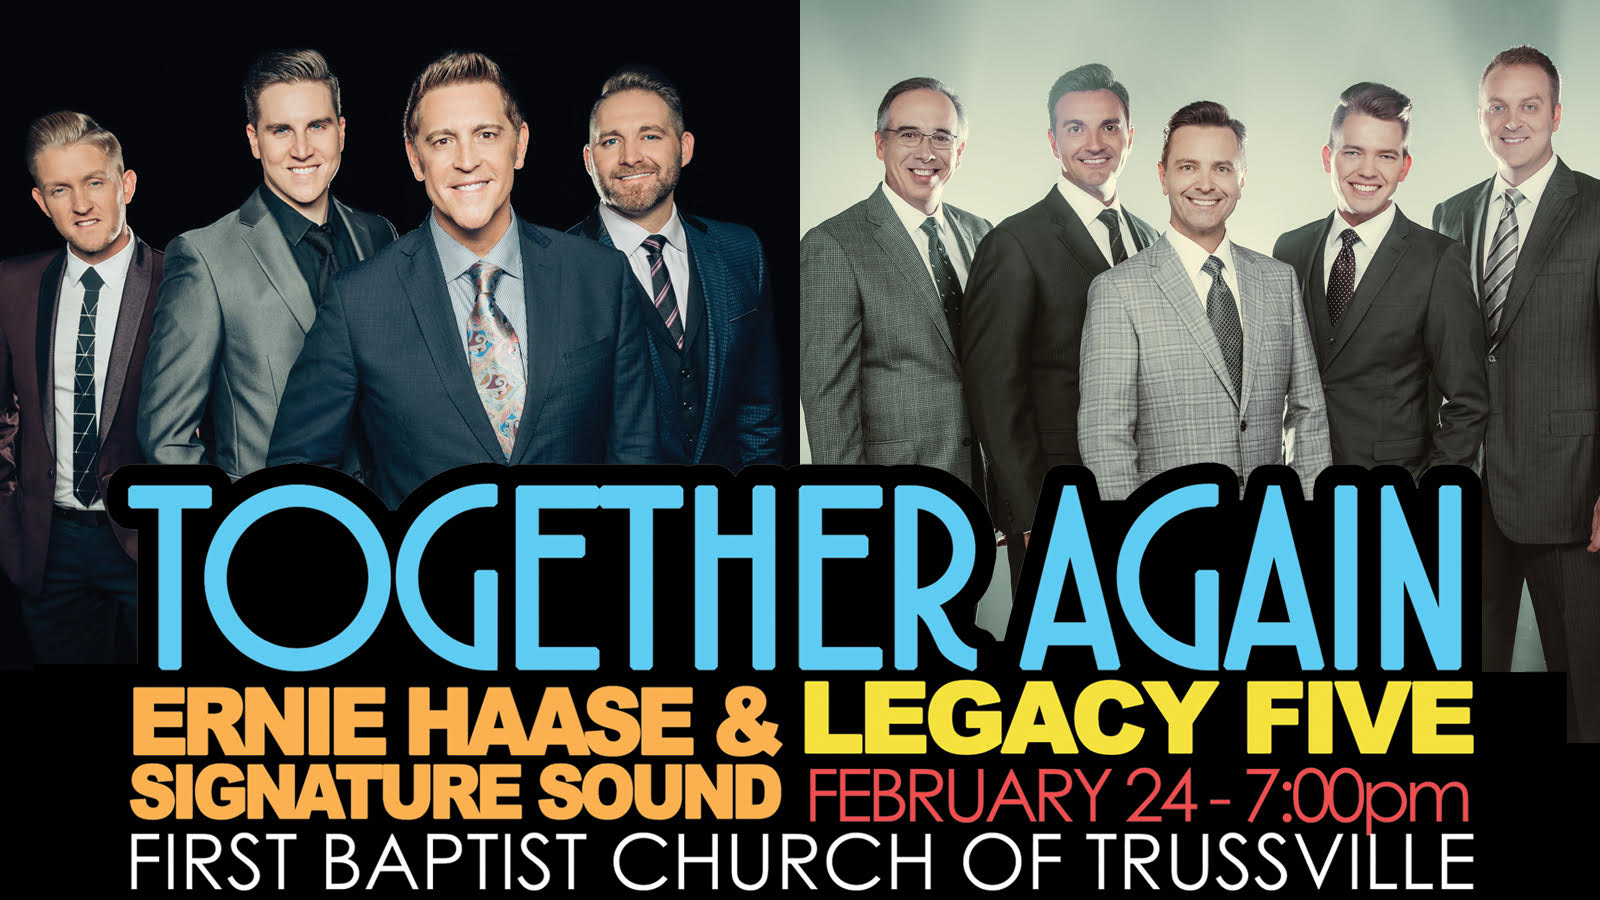 Legendary gospel groups coming together for concert in Trussville